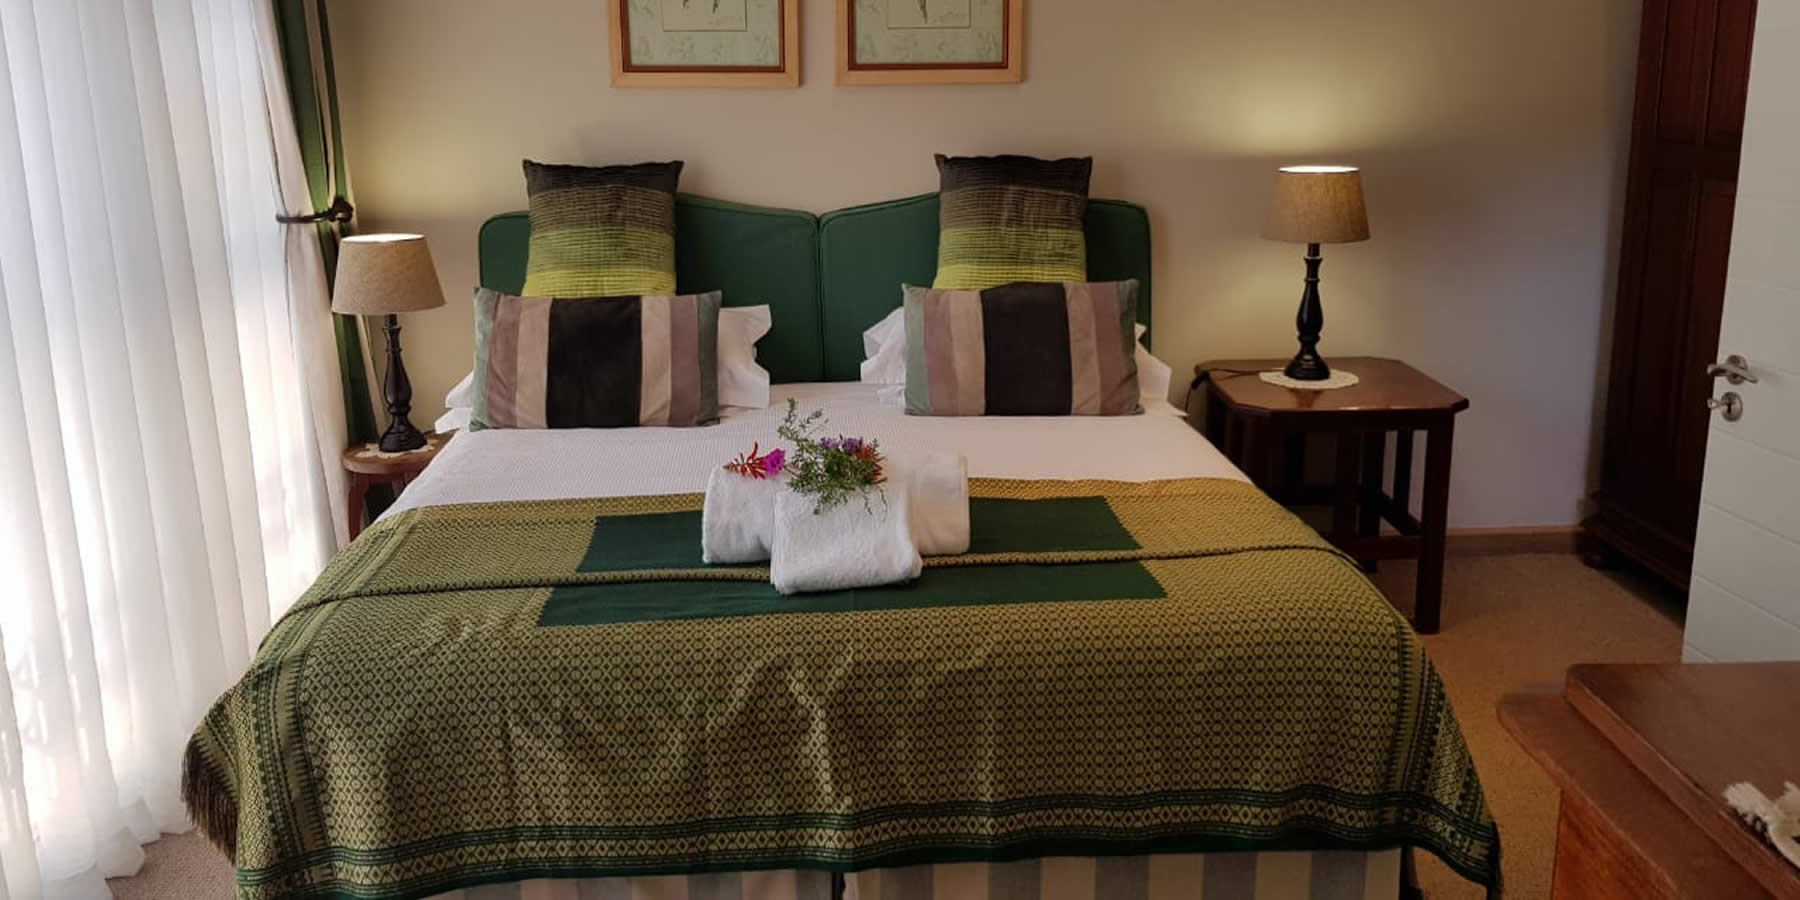 Antique room - Bed